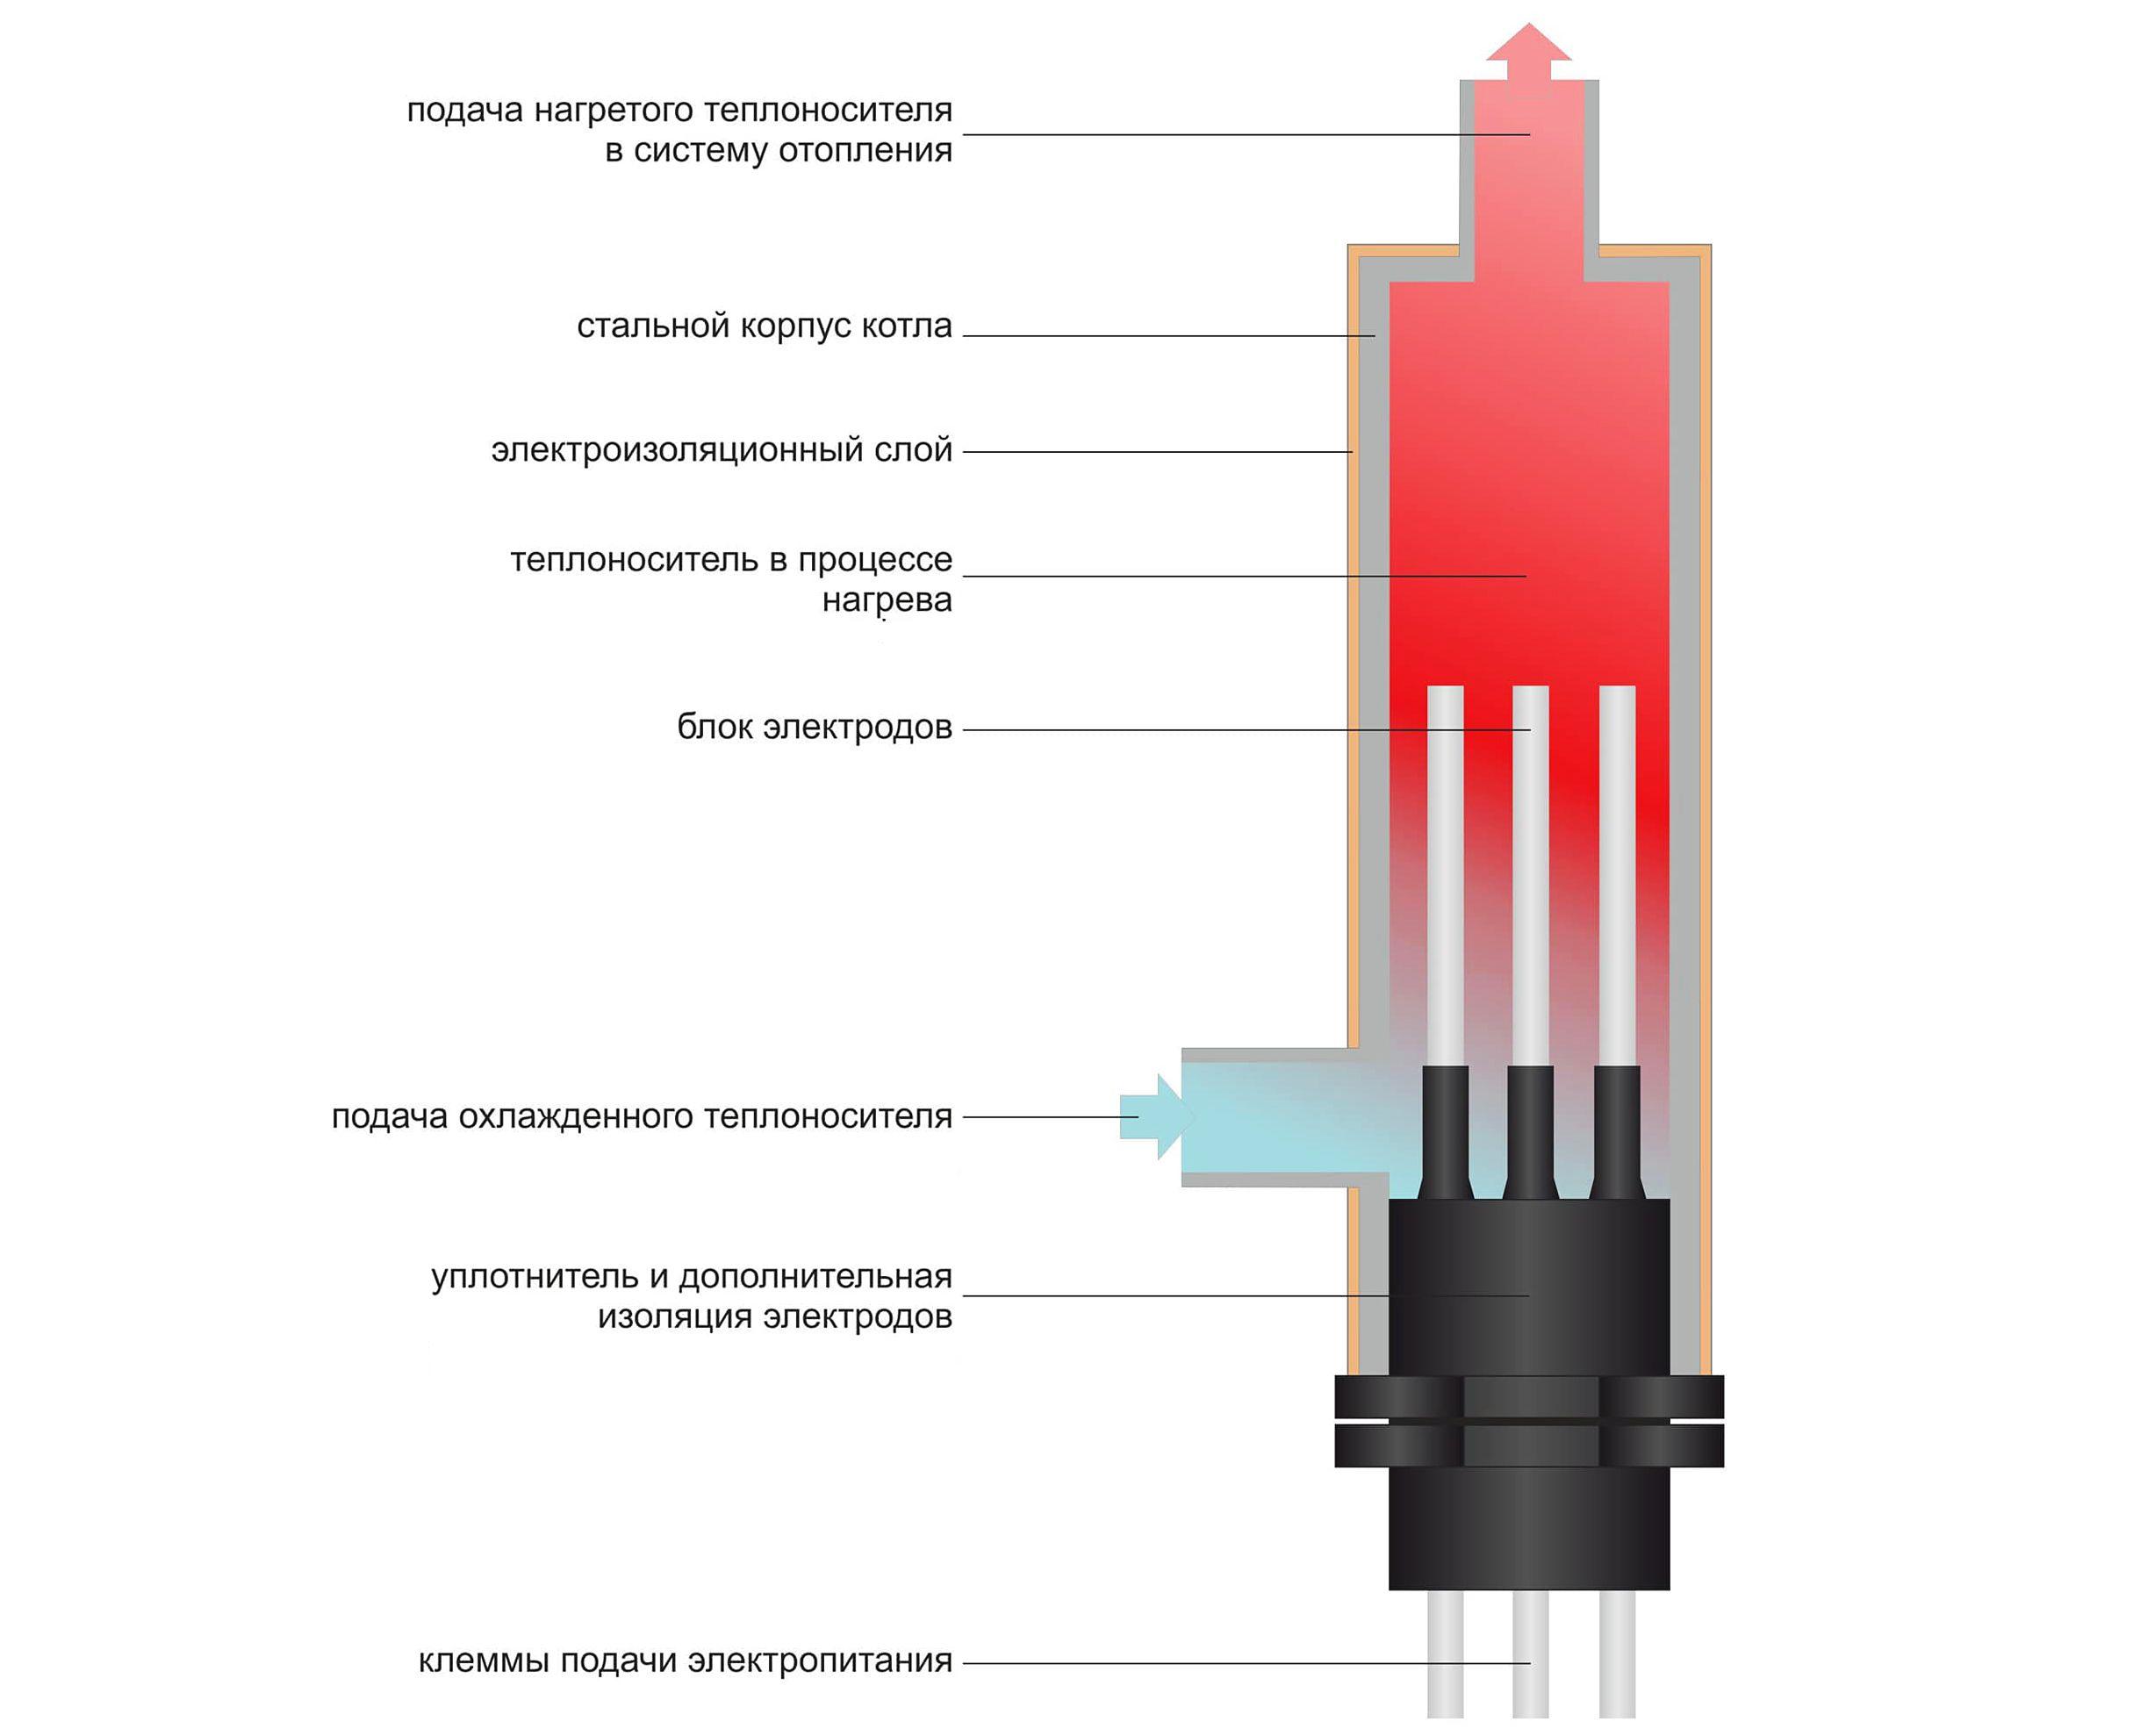 Отопление дома при помощи водородного котла: характеристики, преимущества и недостатки